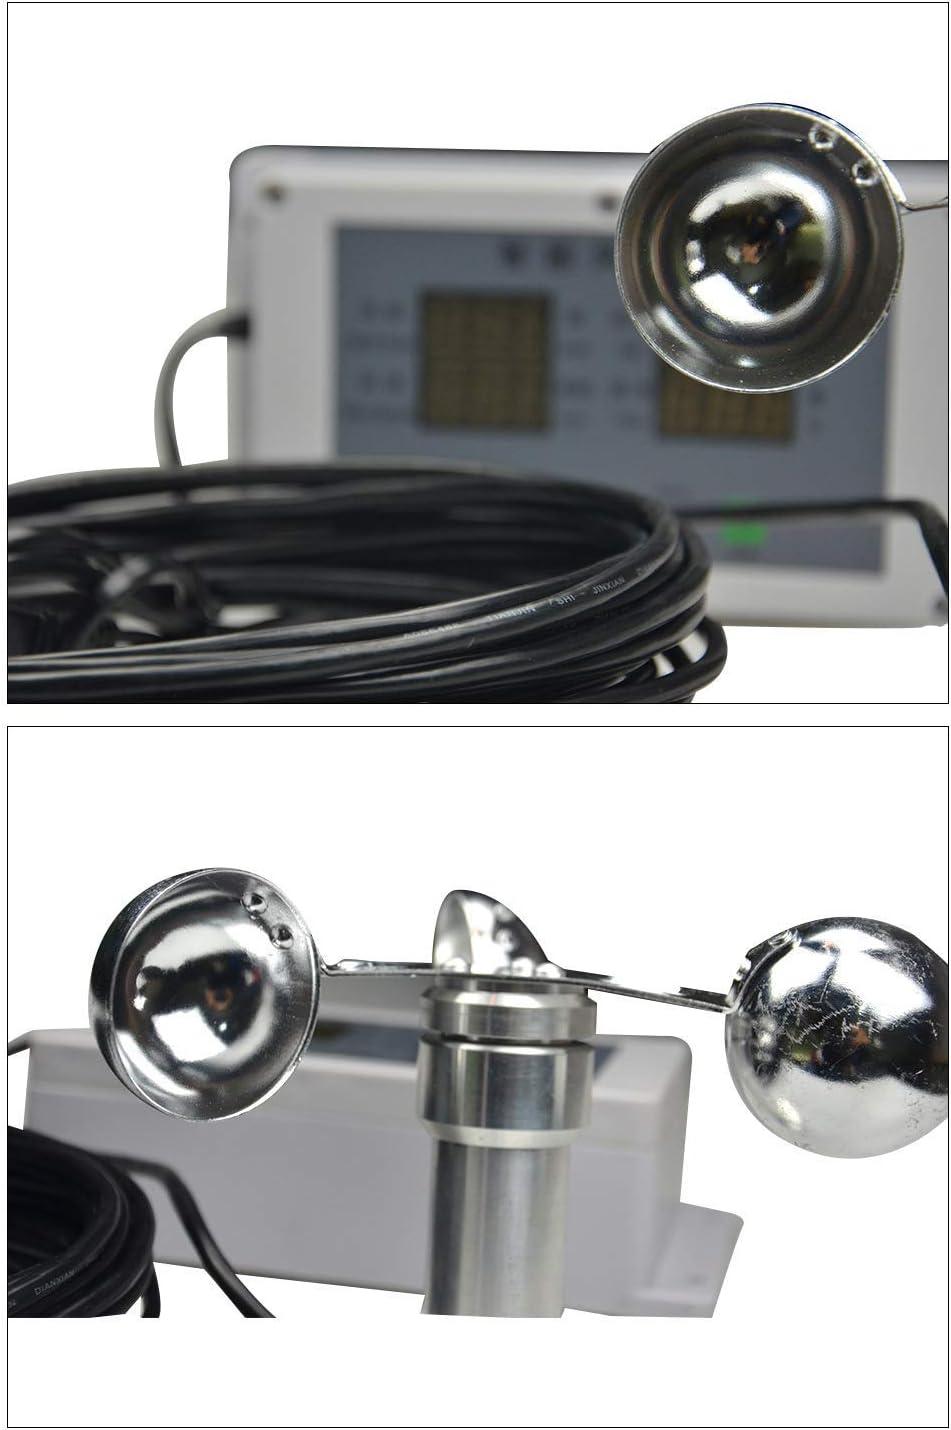 Alumiunm Sensor WXQ-XQ Tower Crane Wind Speed Meter Anemometer Temperature Transmitter Sensor for Ship Crane Tower